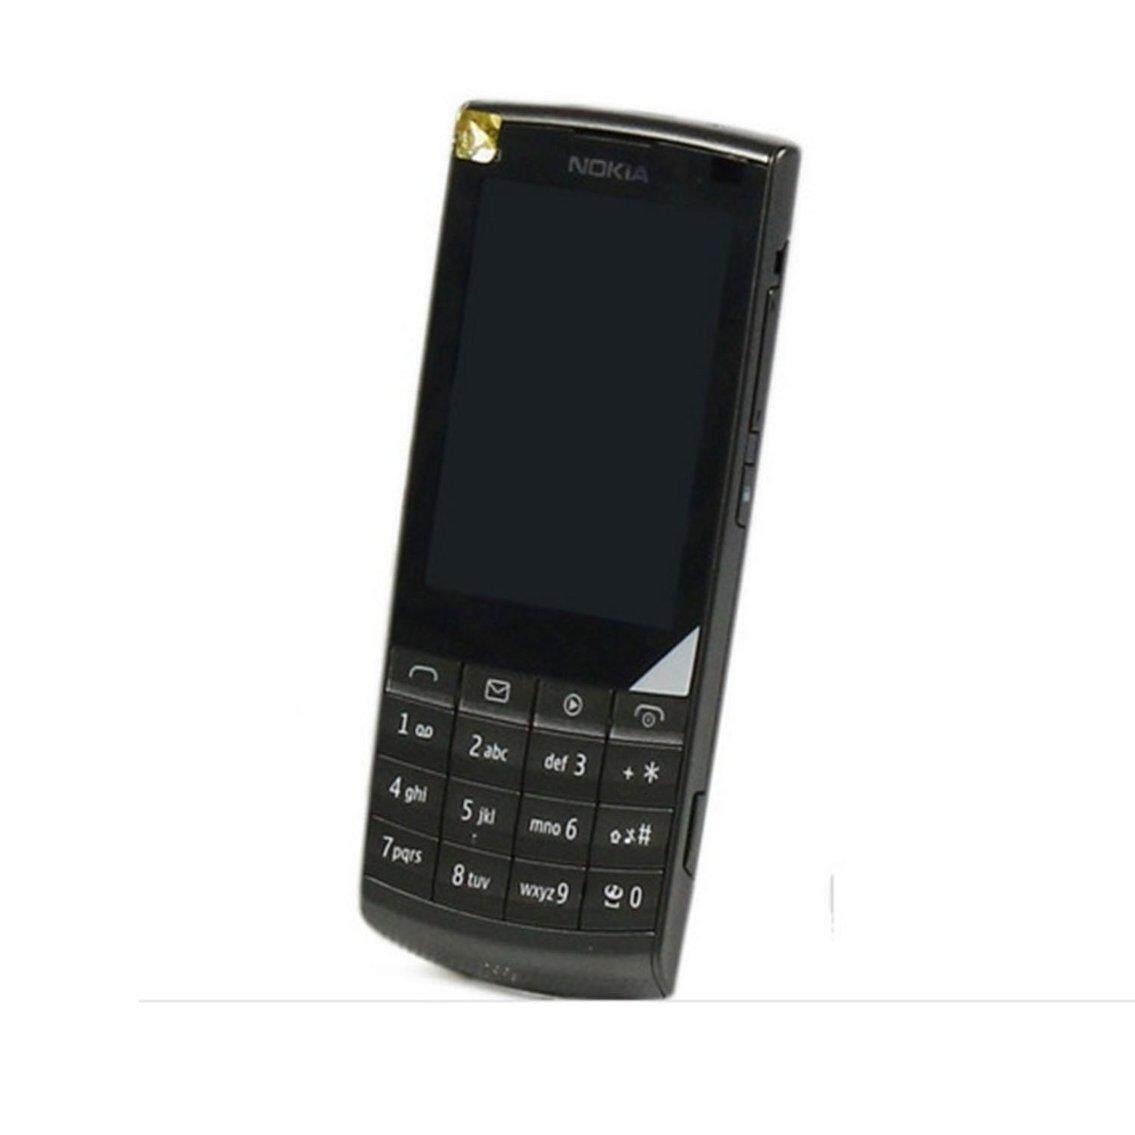 Nokia x3 rm 540 service schematics. Www. S manuals. Com. Schematics v1. 0.